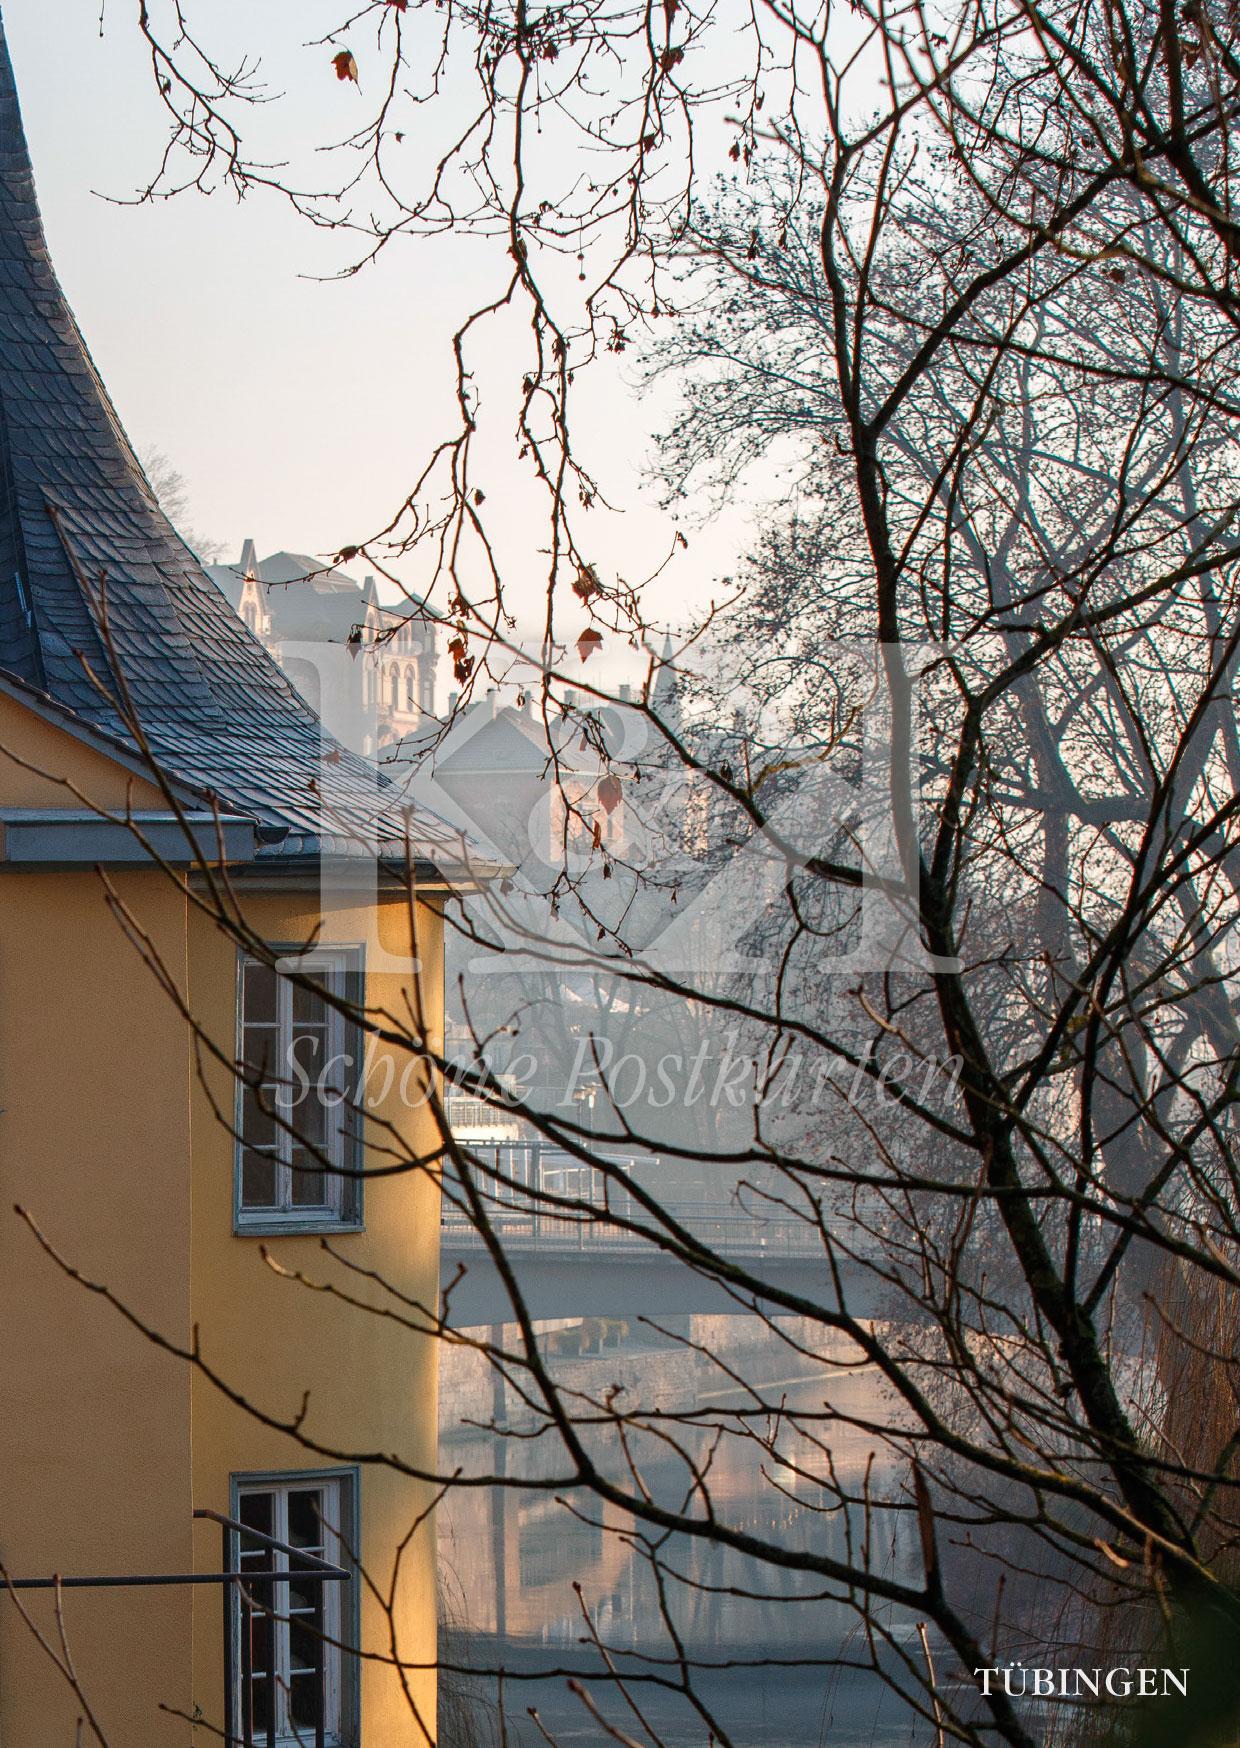 <strong>Schöne Postkarte Nr. 213</strong> · Hölderlinturm an einem sonnigen Wintermorgen © 2018